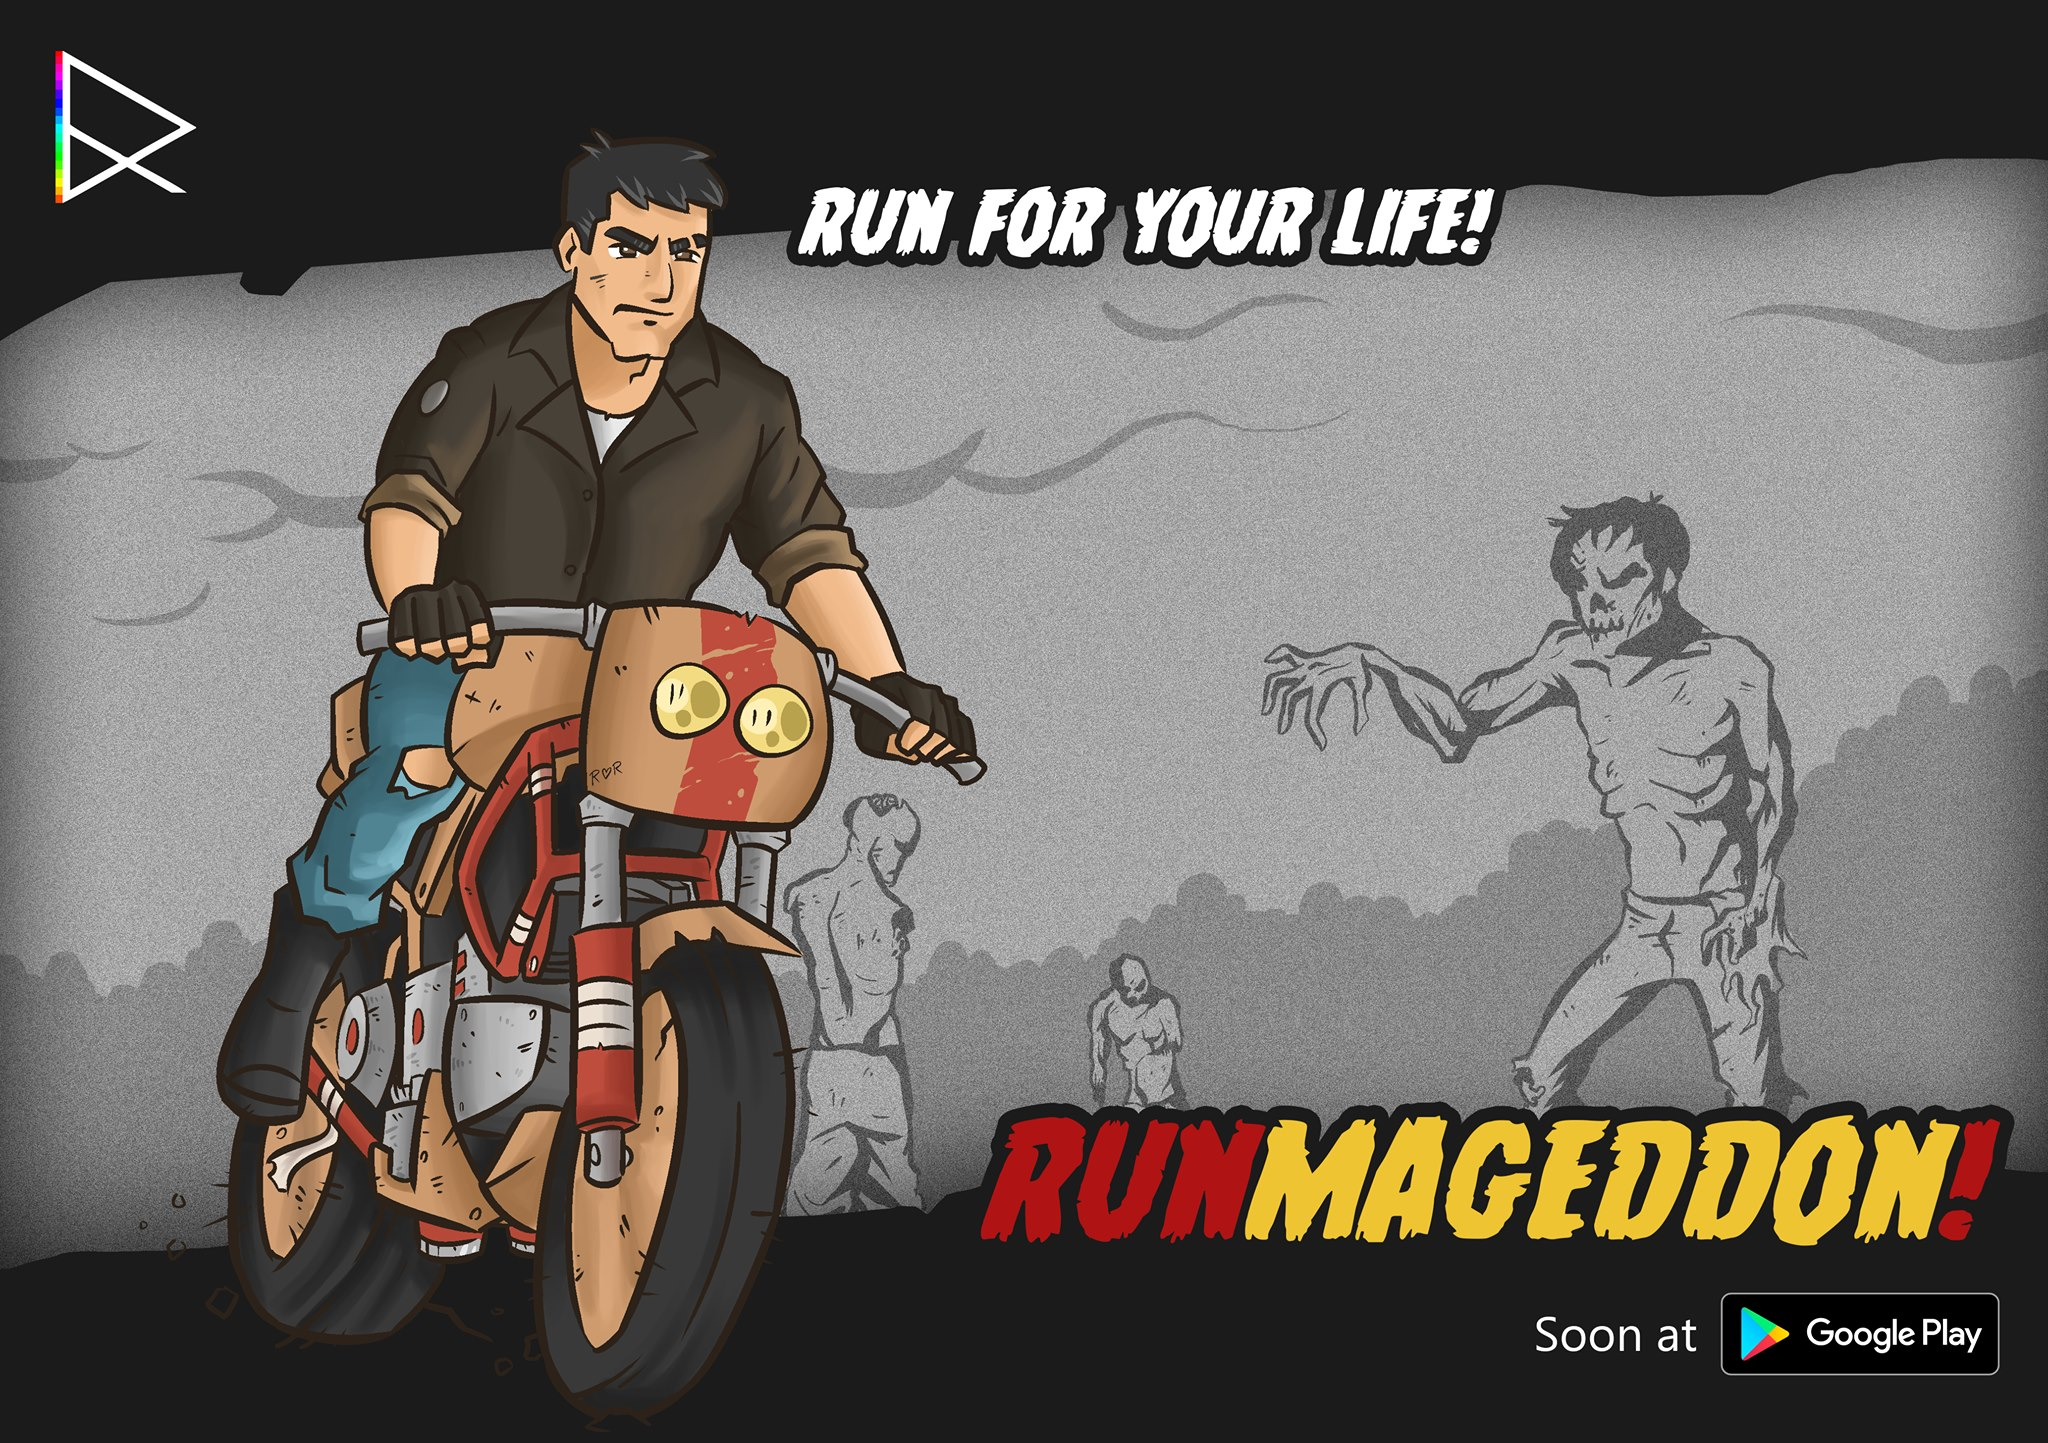 Runmageddon!